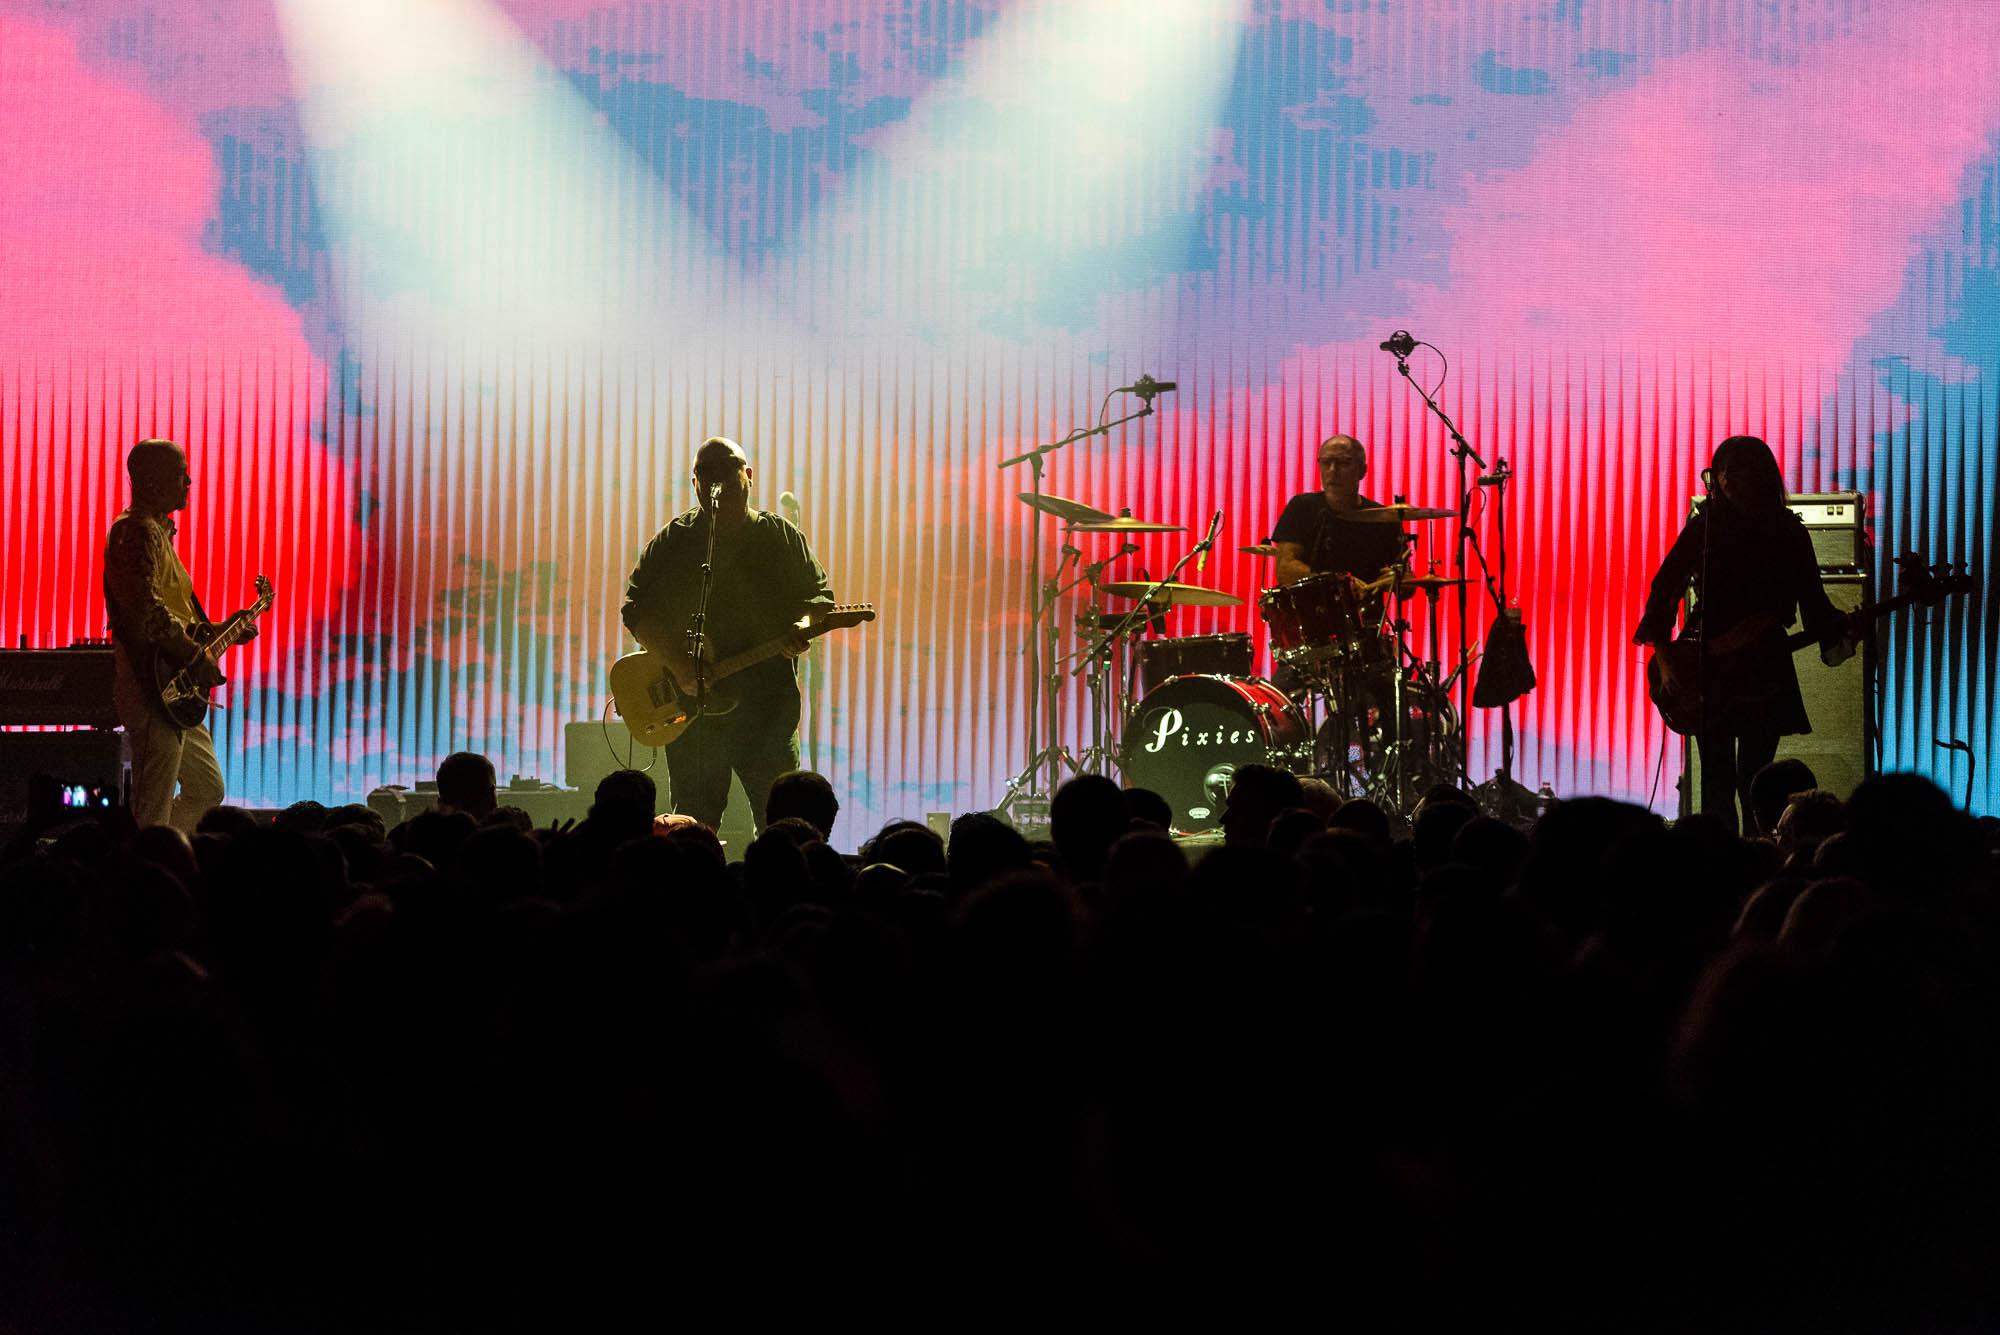 Pixies at Brooklyn Steel on Monday, November 19, 2018.